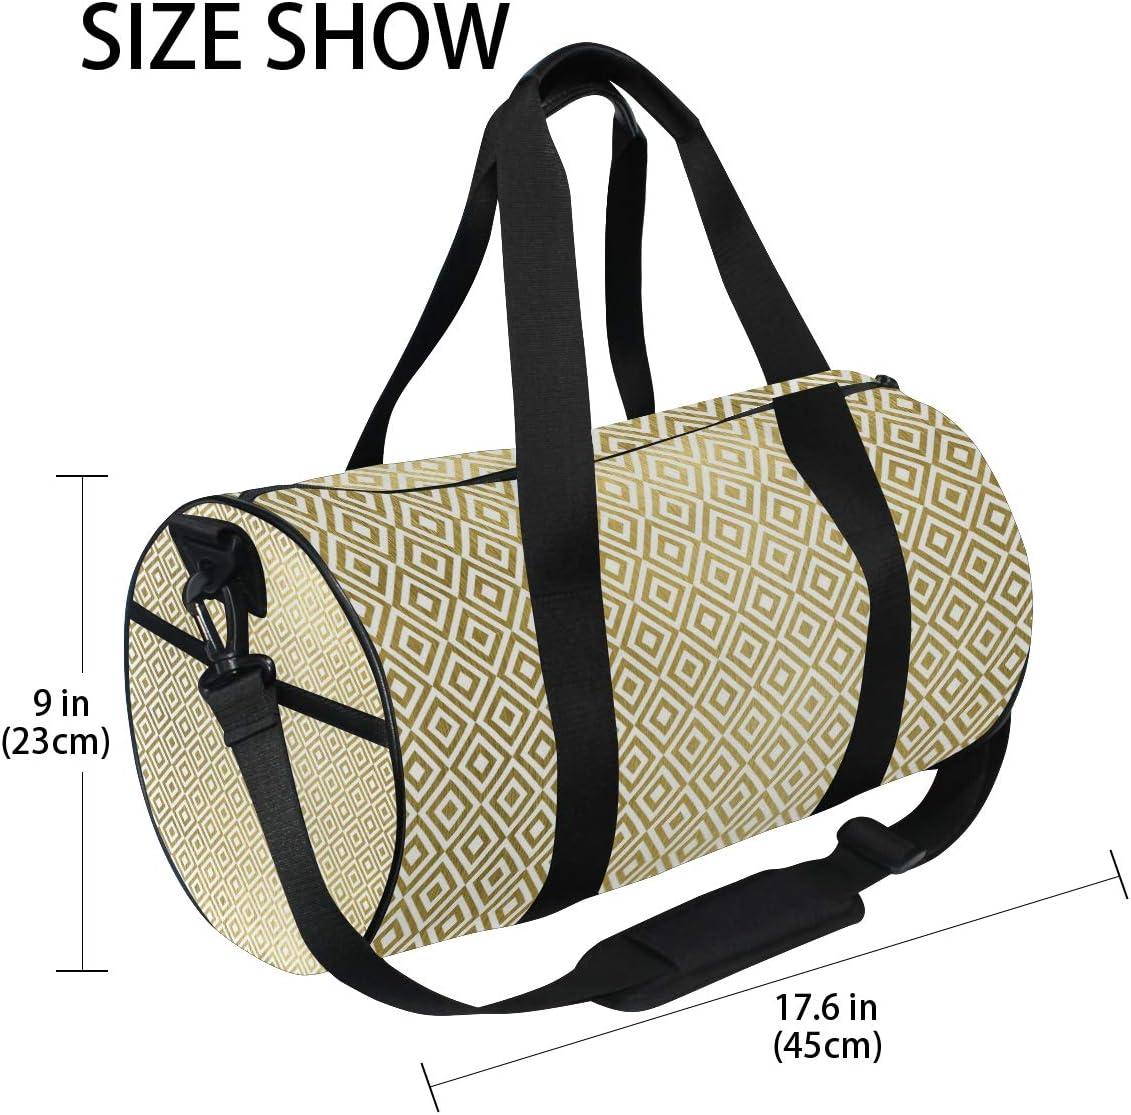 MALPLENA Shinning Golden Square Combination Pattern Drum gym duffel bag women Travel Bag